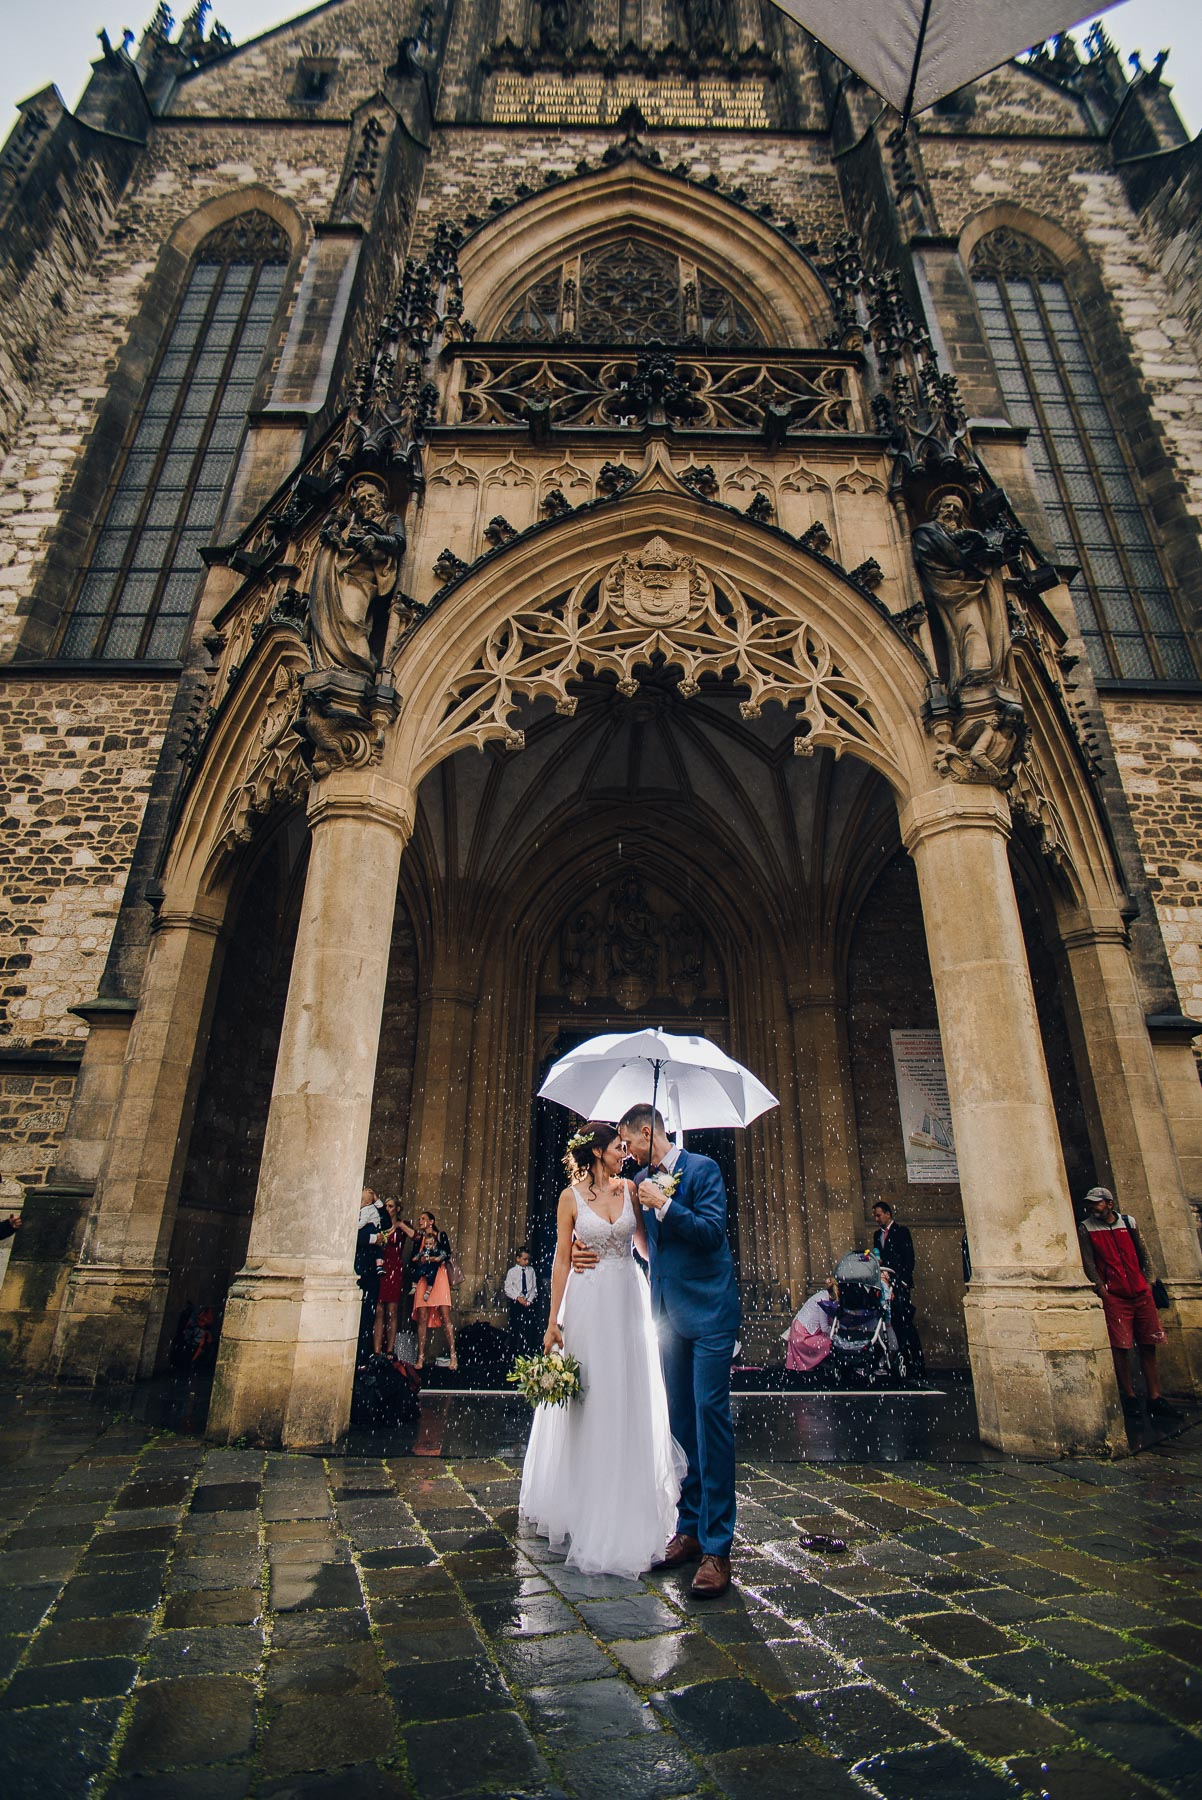 svatební fotograf Brno - svatba Kadlcův Mlýn